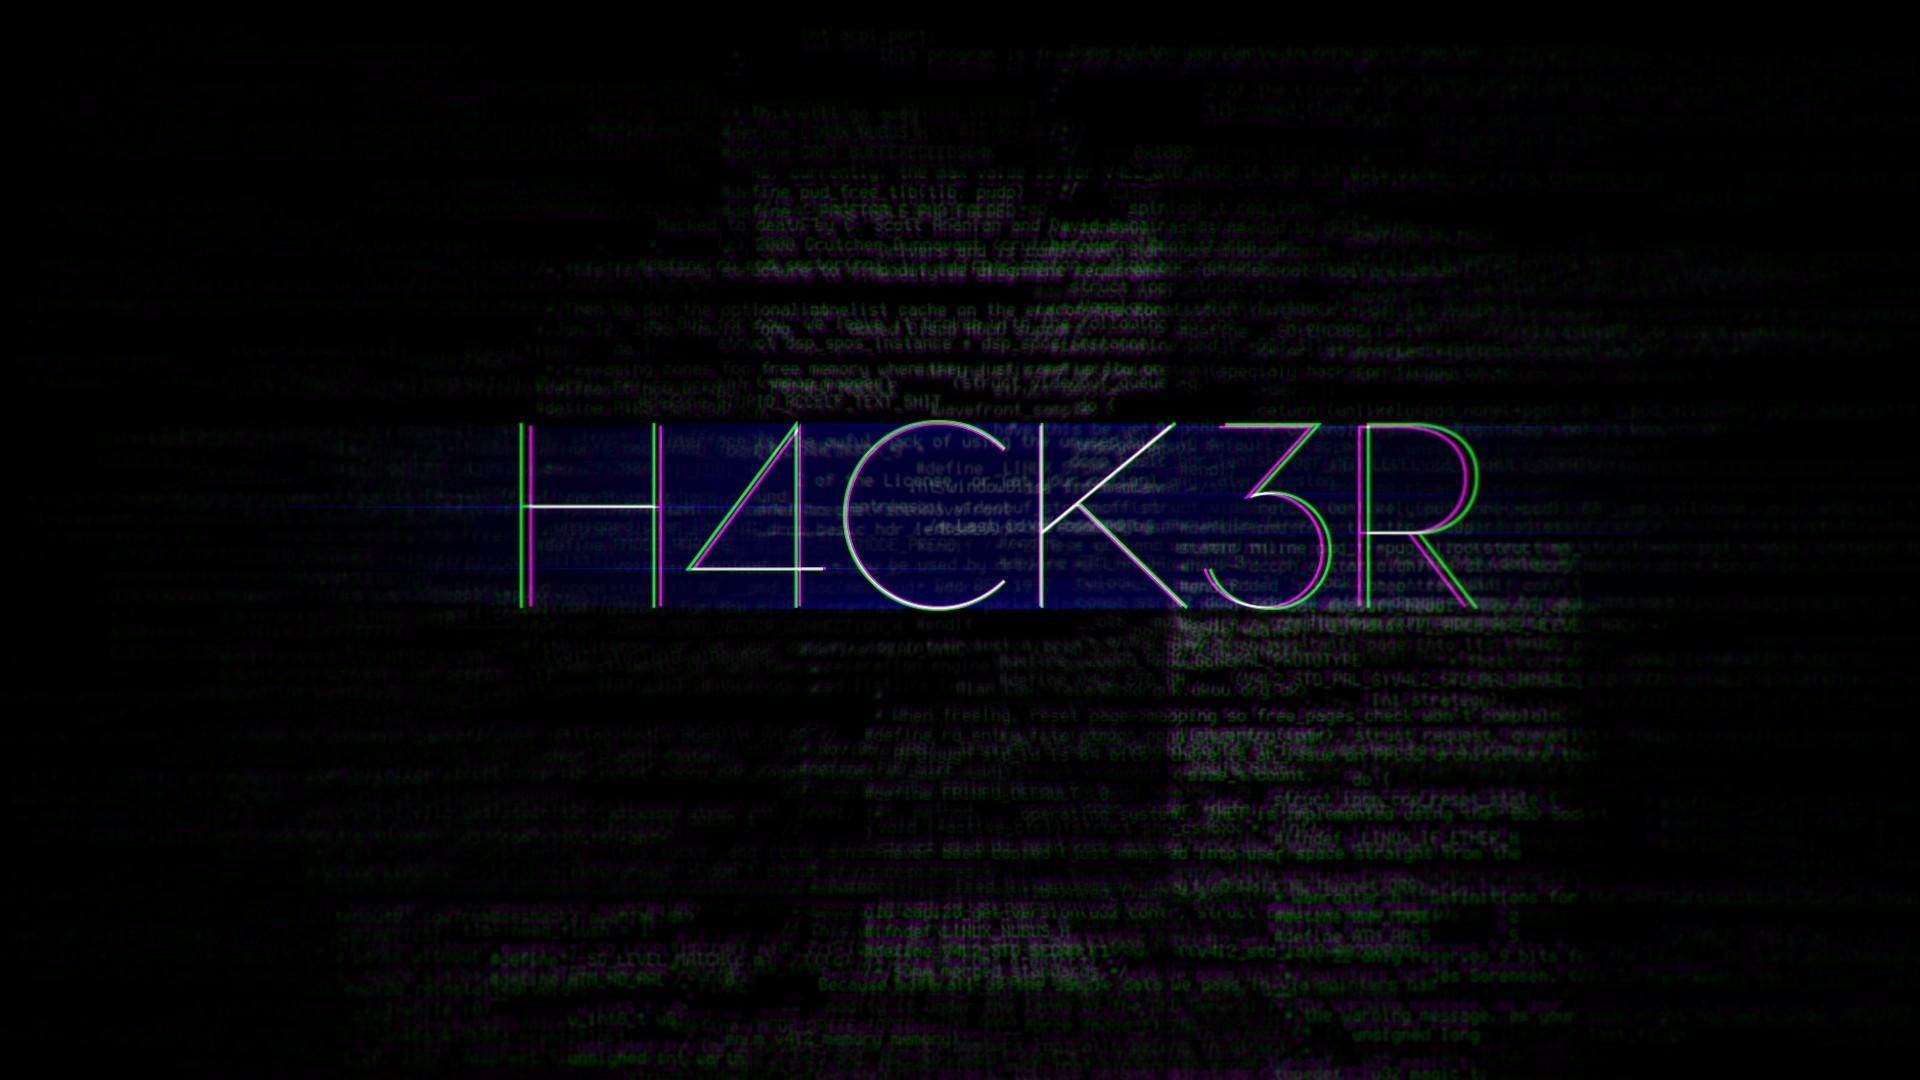 hacker wallpaper 1920x1080 - photo #1